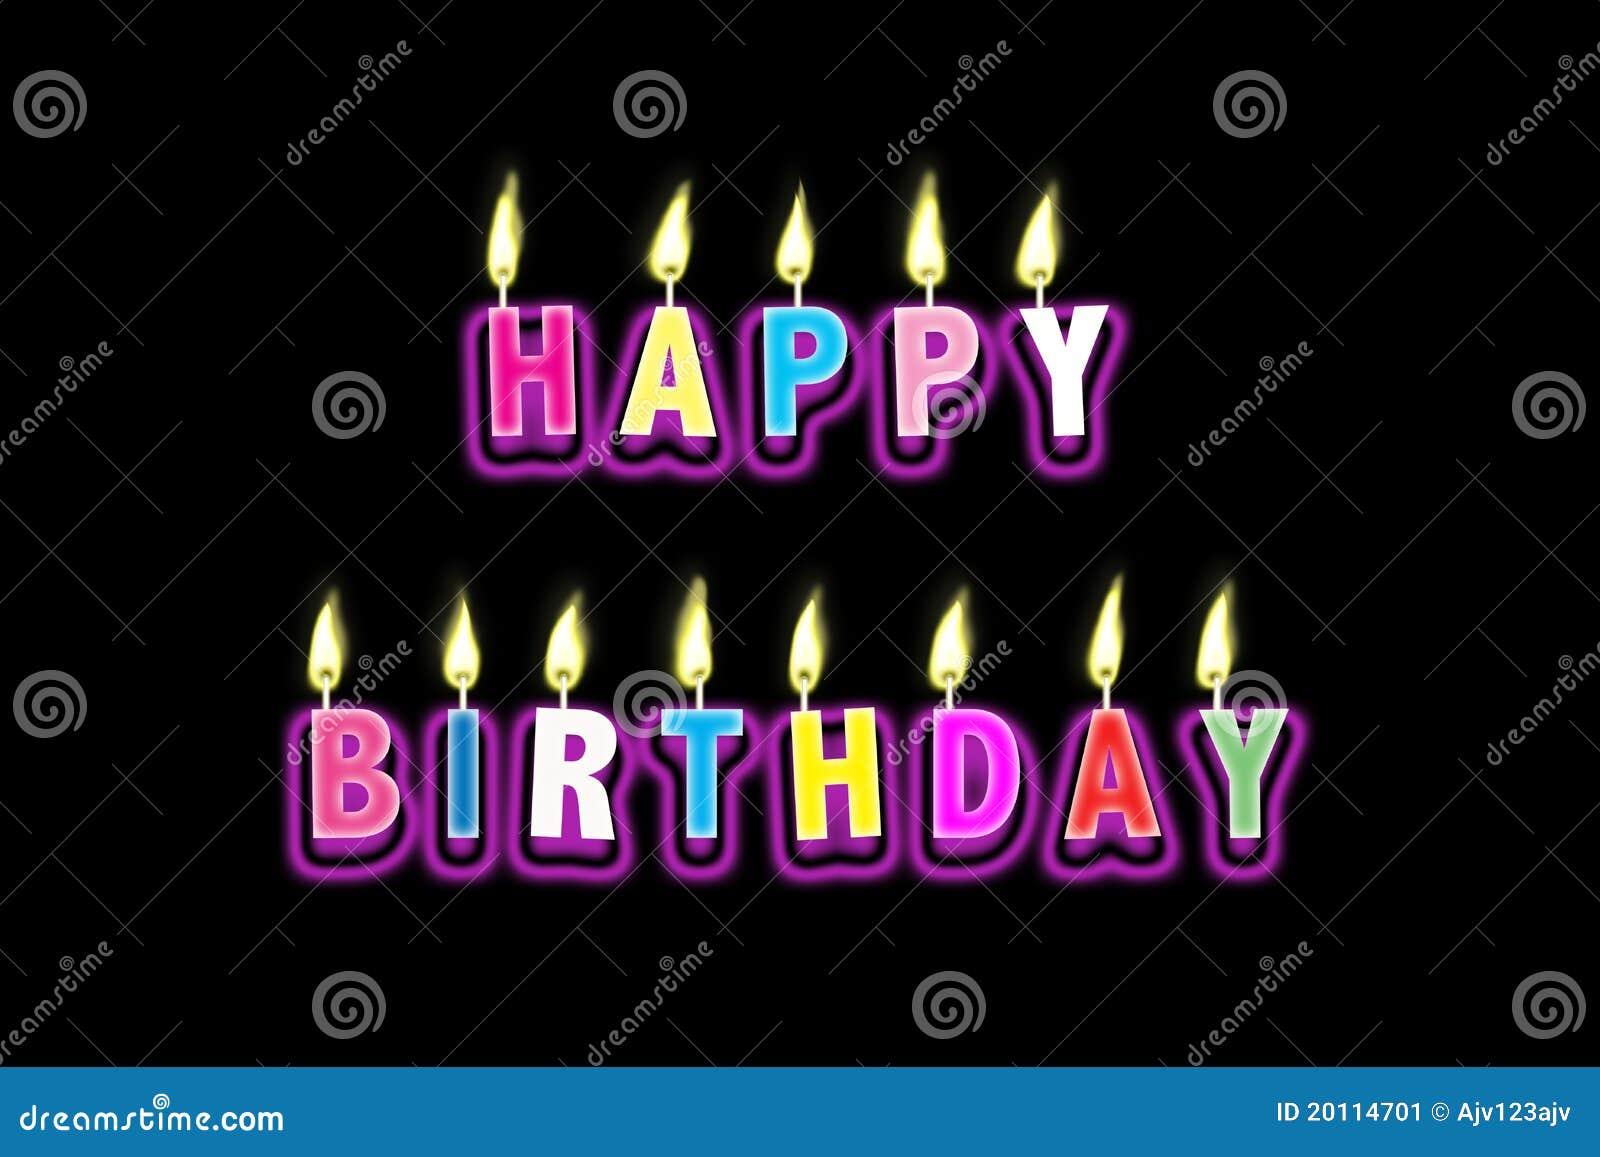 Happy Birthday Candles Animated Happy Birthday Candles Stock